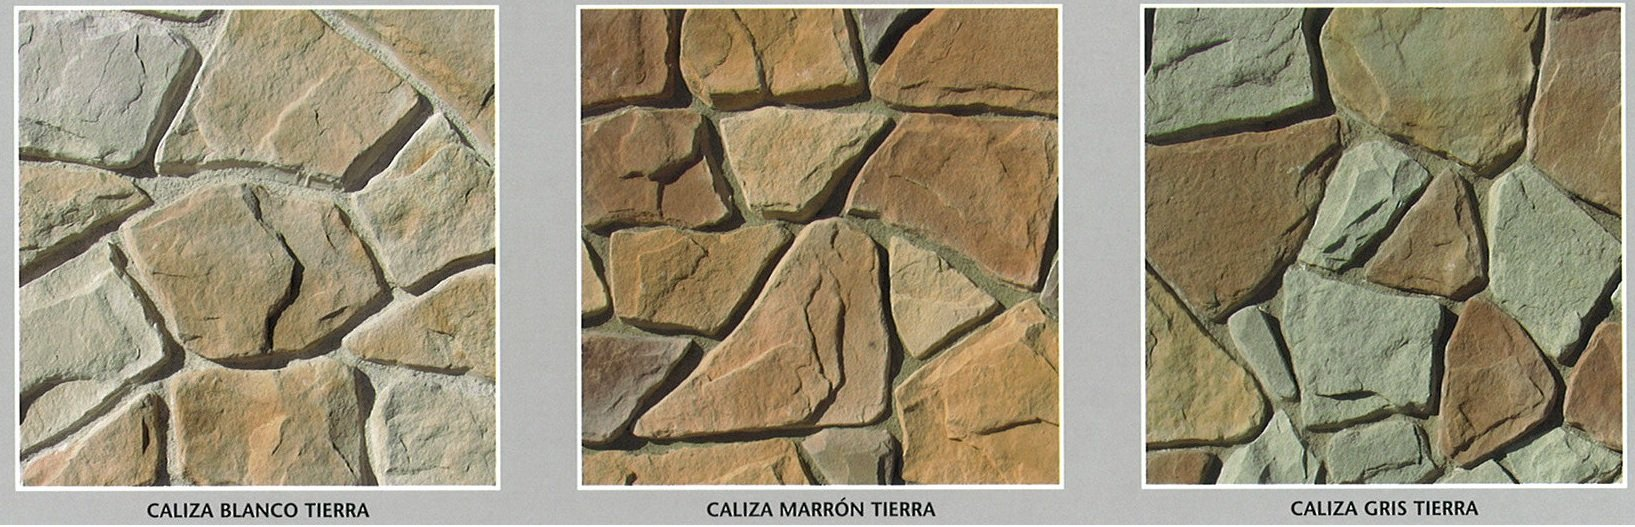 piedra cultivada caliza modelos